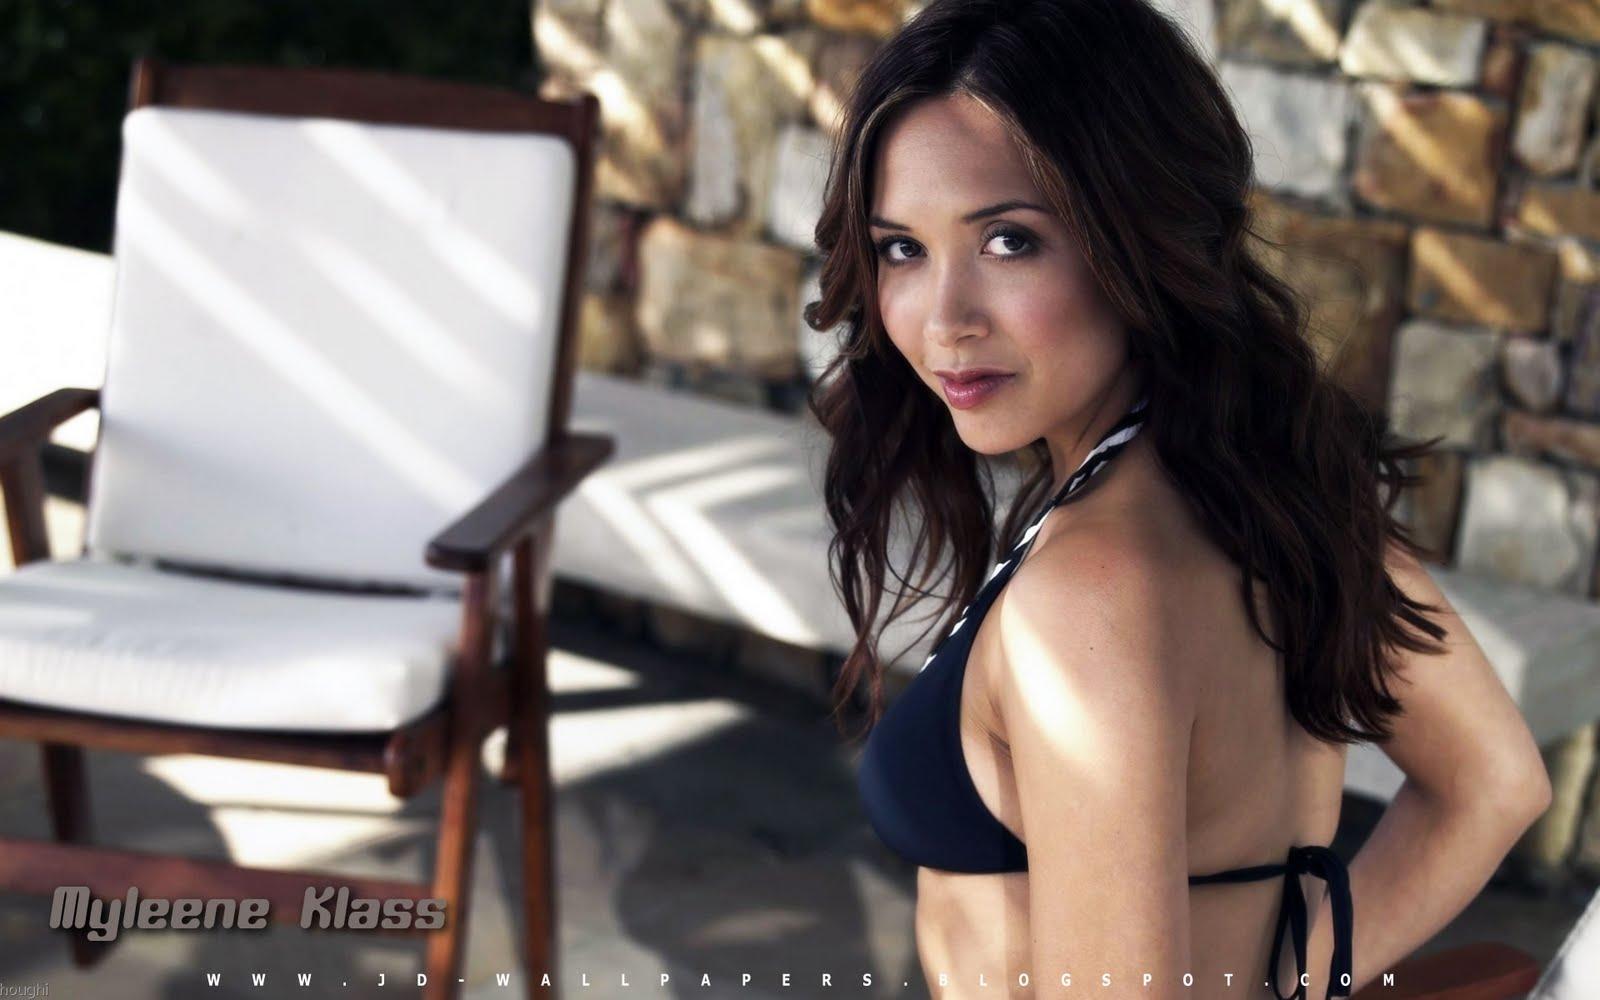 http://2.bp.blogspot.com/_vClfjdJc8Jk/SwUree55EqI/AAAAAAAADxs/pHUe34g1ze4/s1600/myleene_klass_sexy-hot-nude-bold-dunya-wallpapers-jago-dunya.jpg